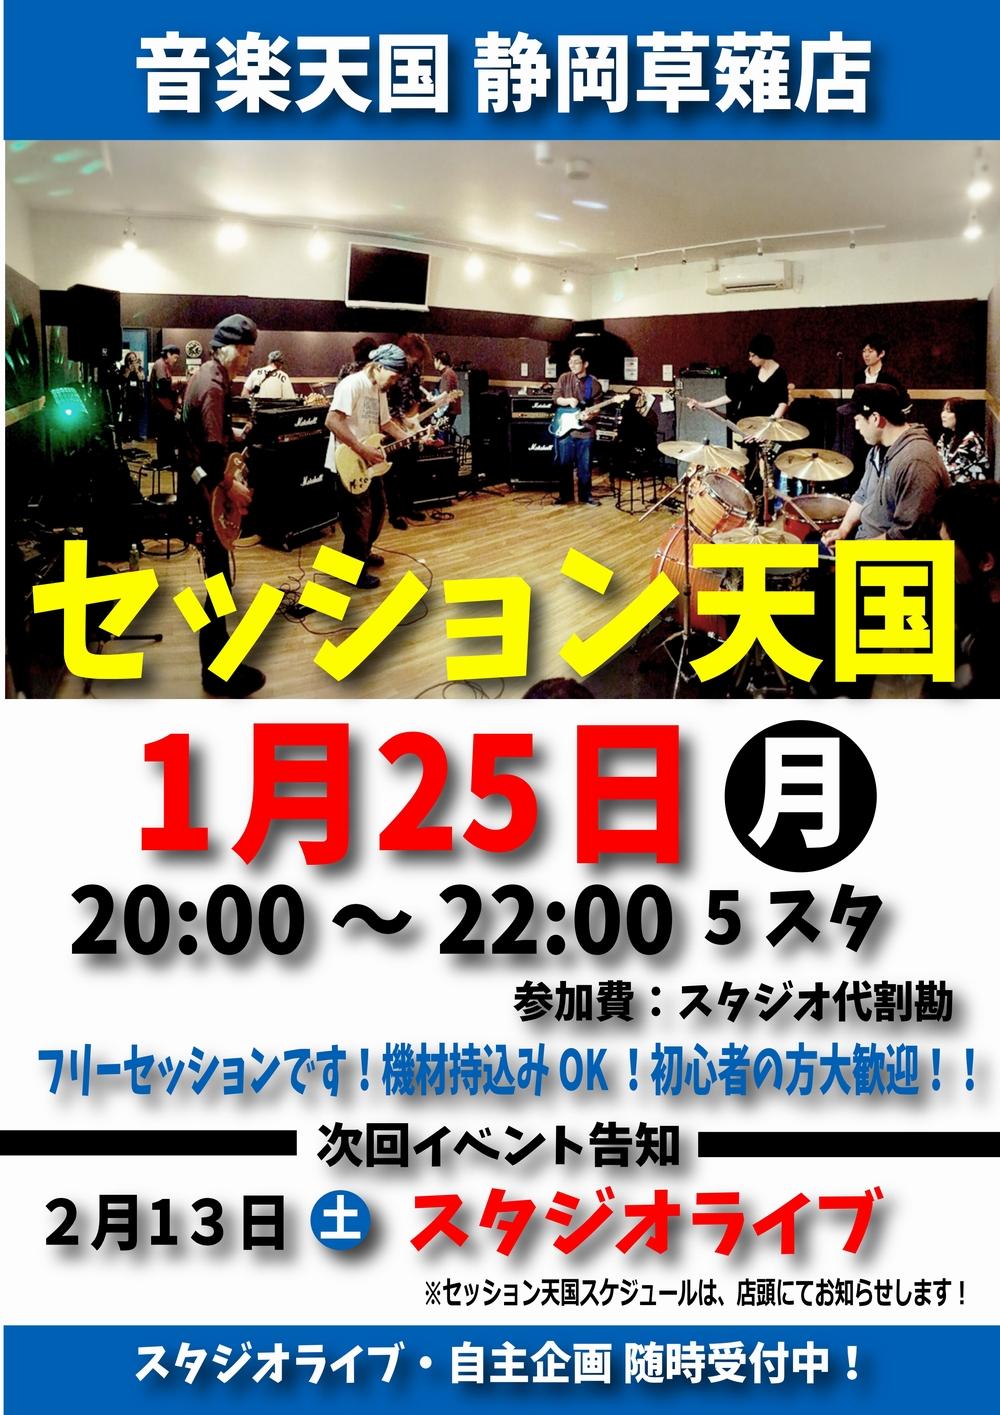 【セッション天国】音楽天国・静岡草薙店1月25日(月)開催!